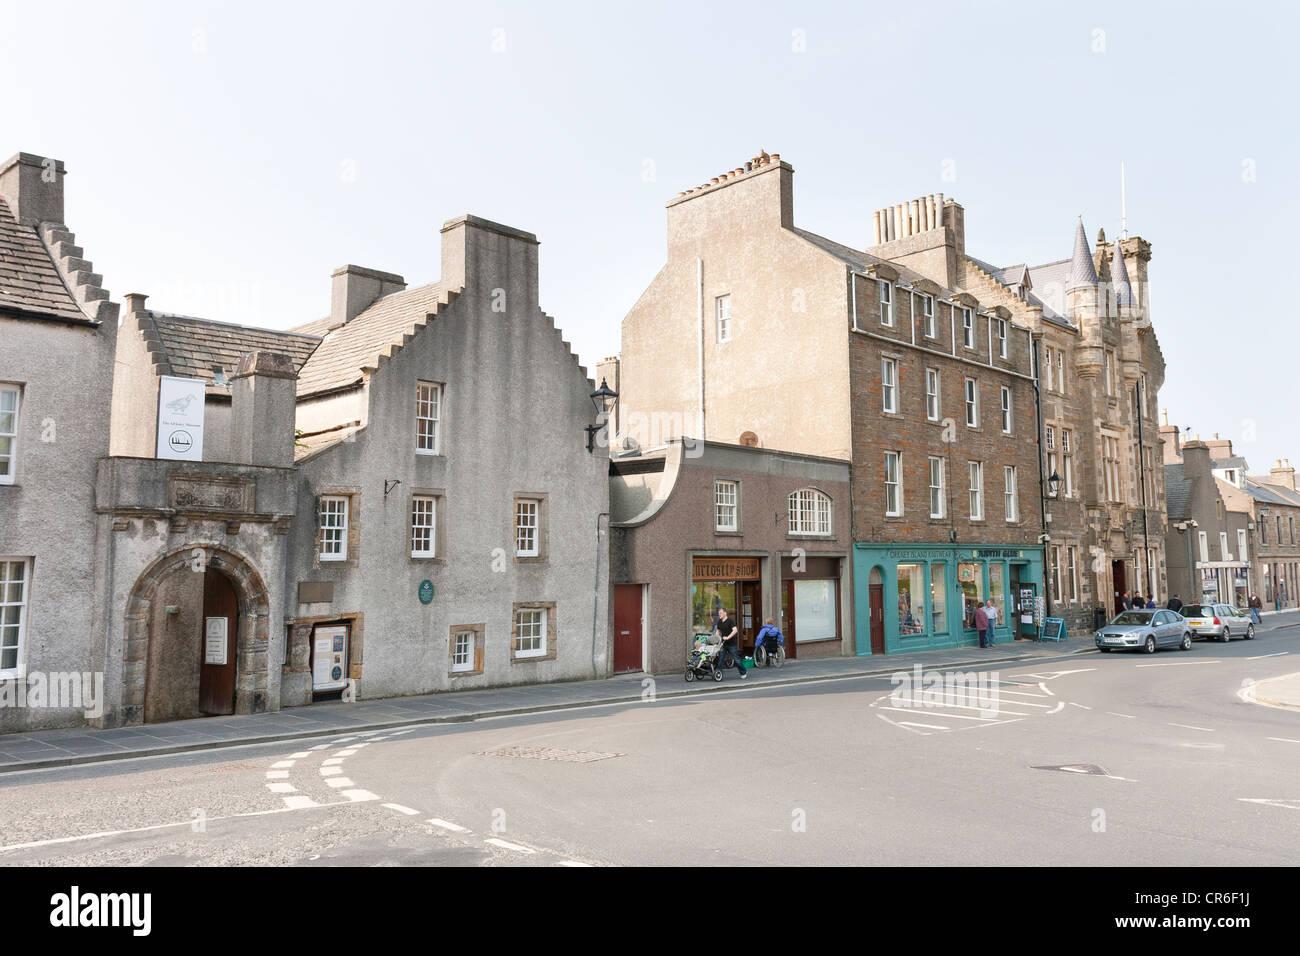 An urban street scene in Kirkwall on the Orkney Islands - Stock Image